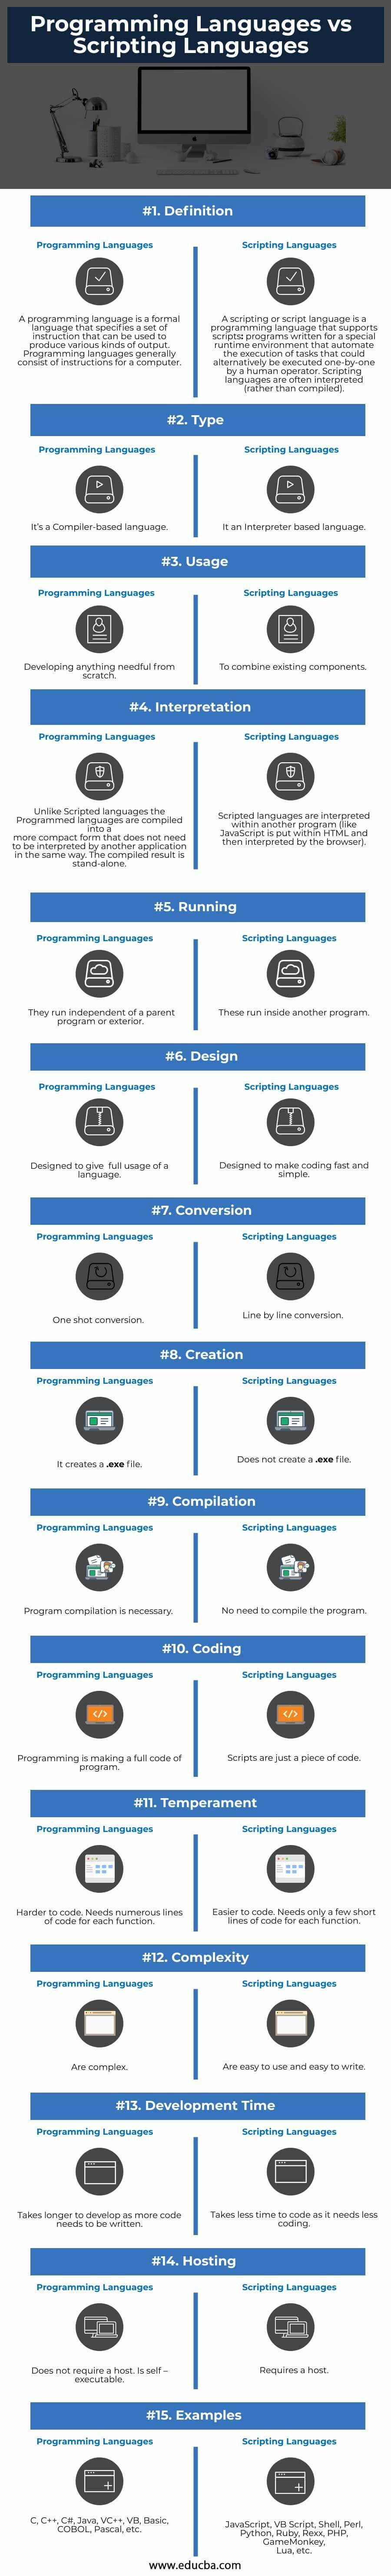 Programming-Languages-vs-Scripting-Languages-info